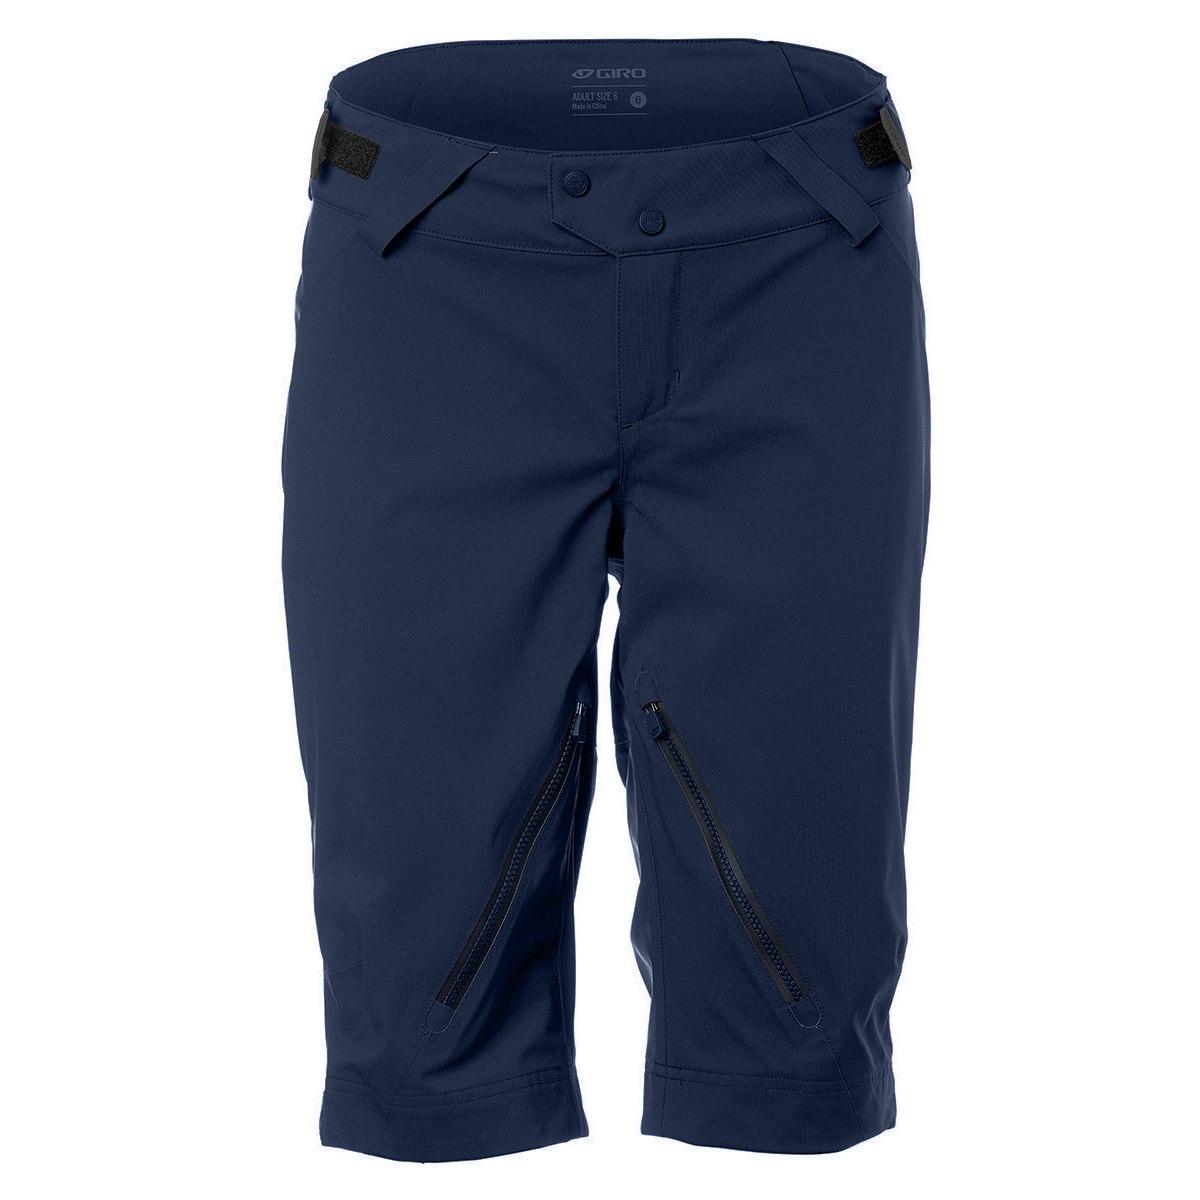 Giro Havoc H2O Women's Short - midnight blue